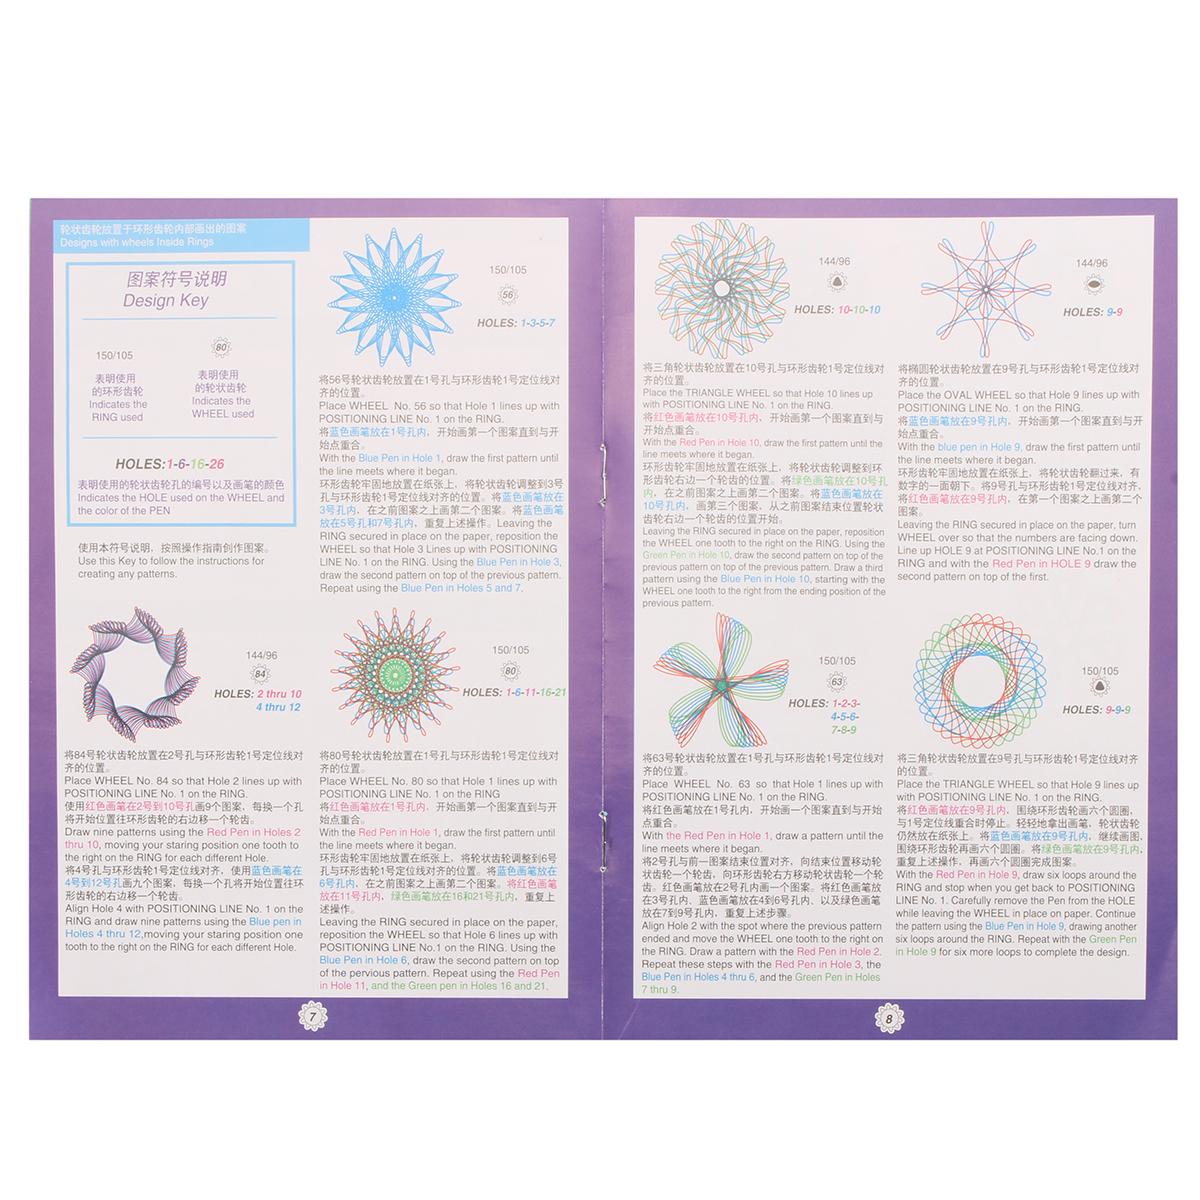 25Pcs Spirograph Deluxe Design Set Creative Drawing Spirograph Original Design Cyclex Shapes Kit for Kids Boys Girls Children Educational Intelligence Development